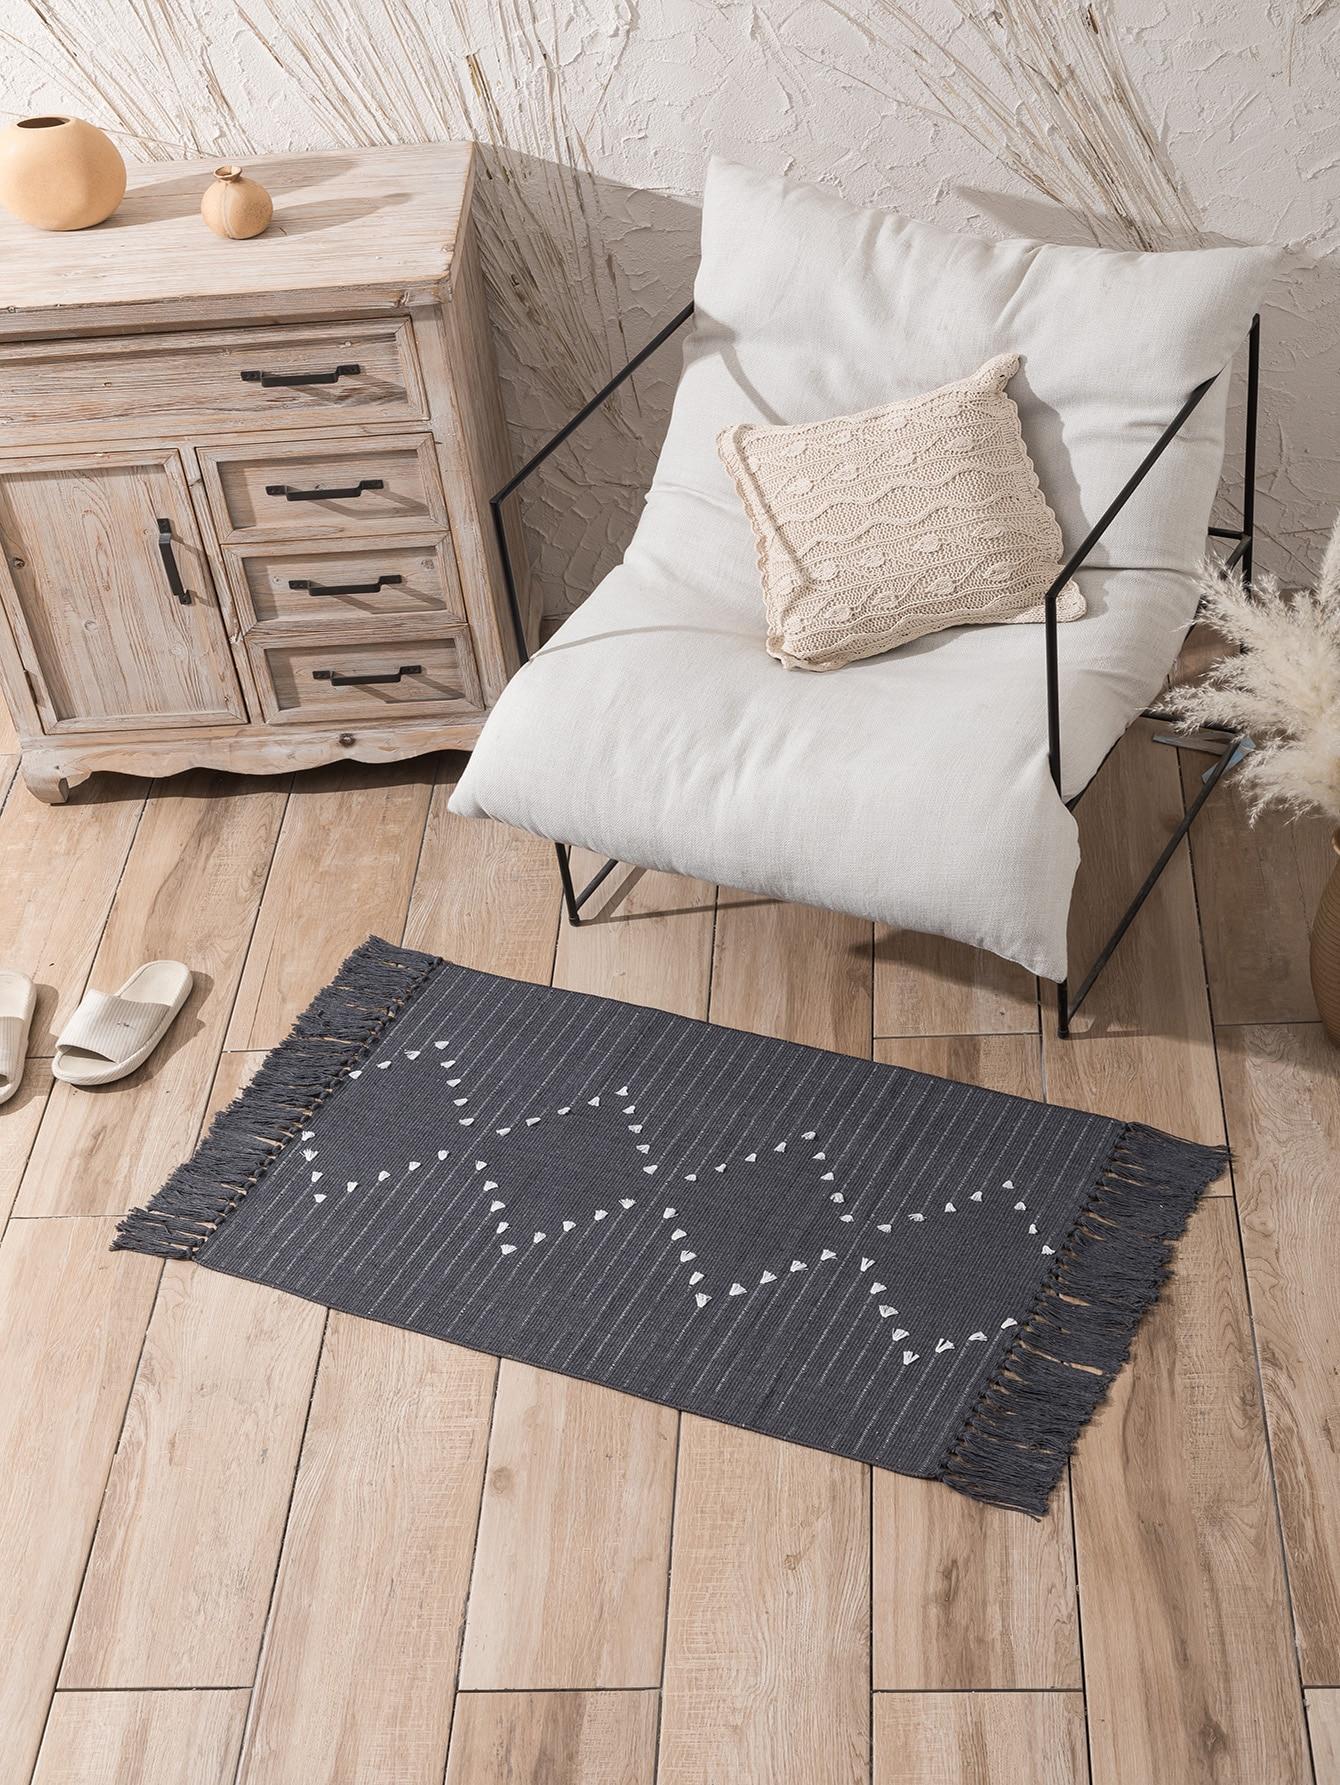 1Pc Tassel Woven Floor Mat